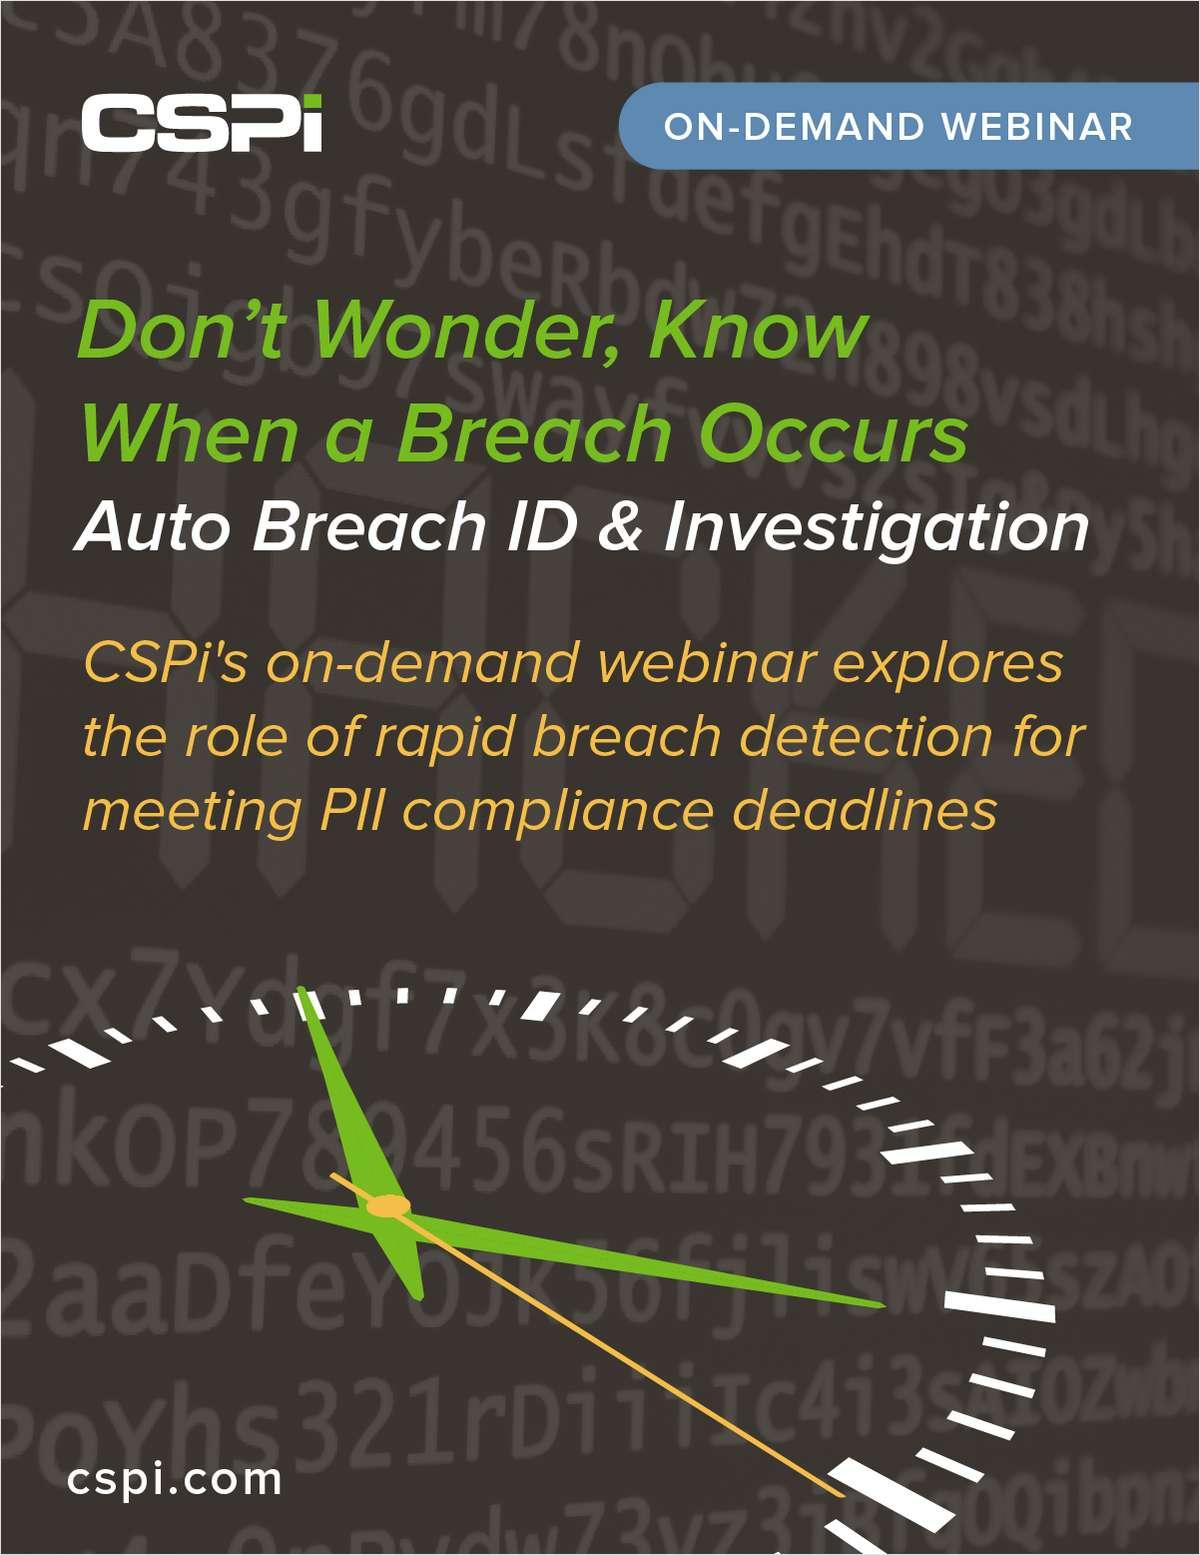 Don't Wonder, Know When a Breach Occurs -- Auto Breach ID & Investigation